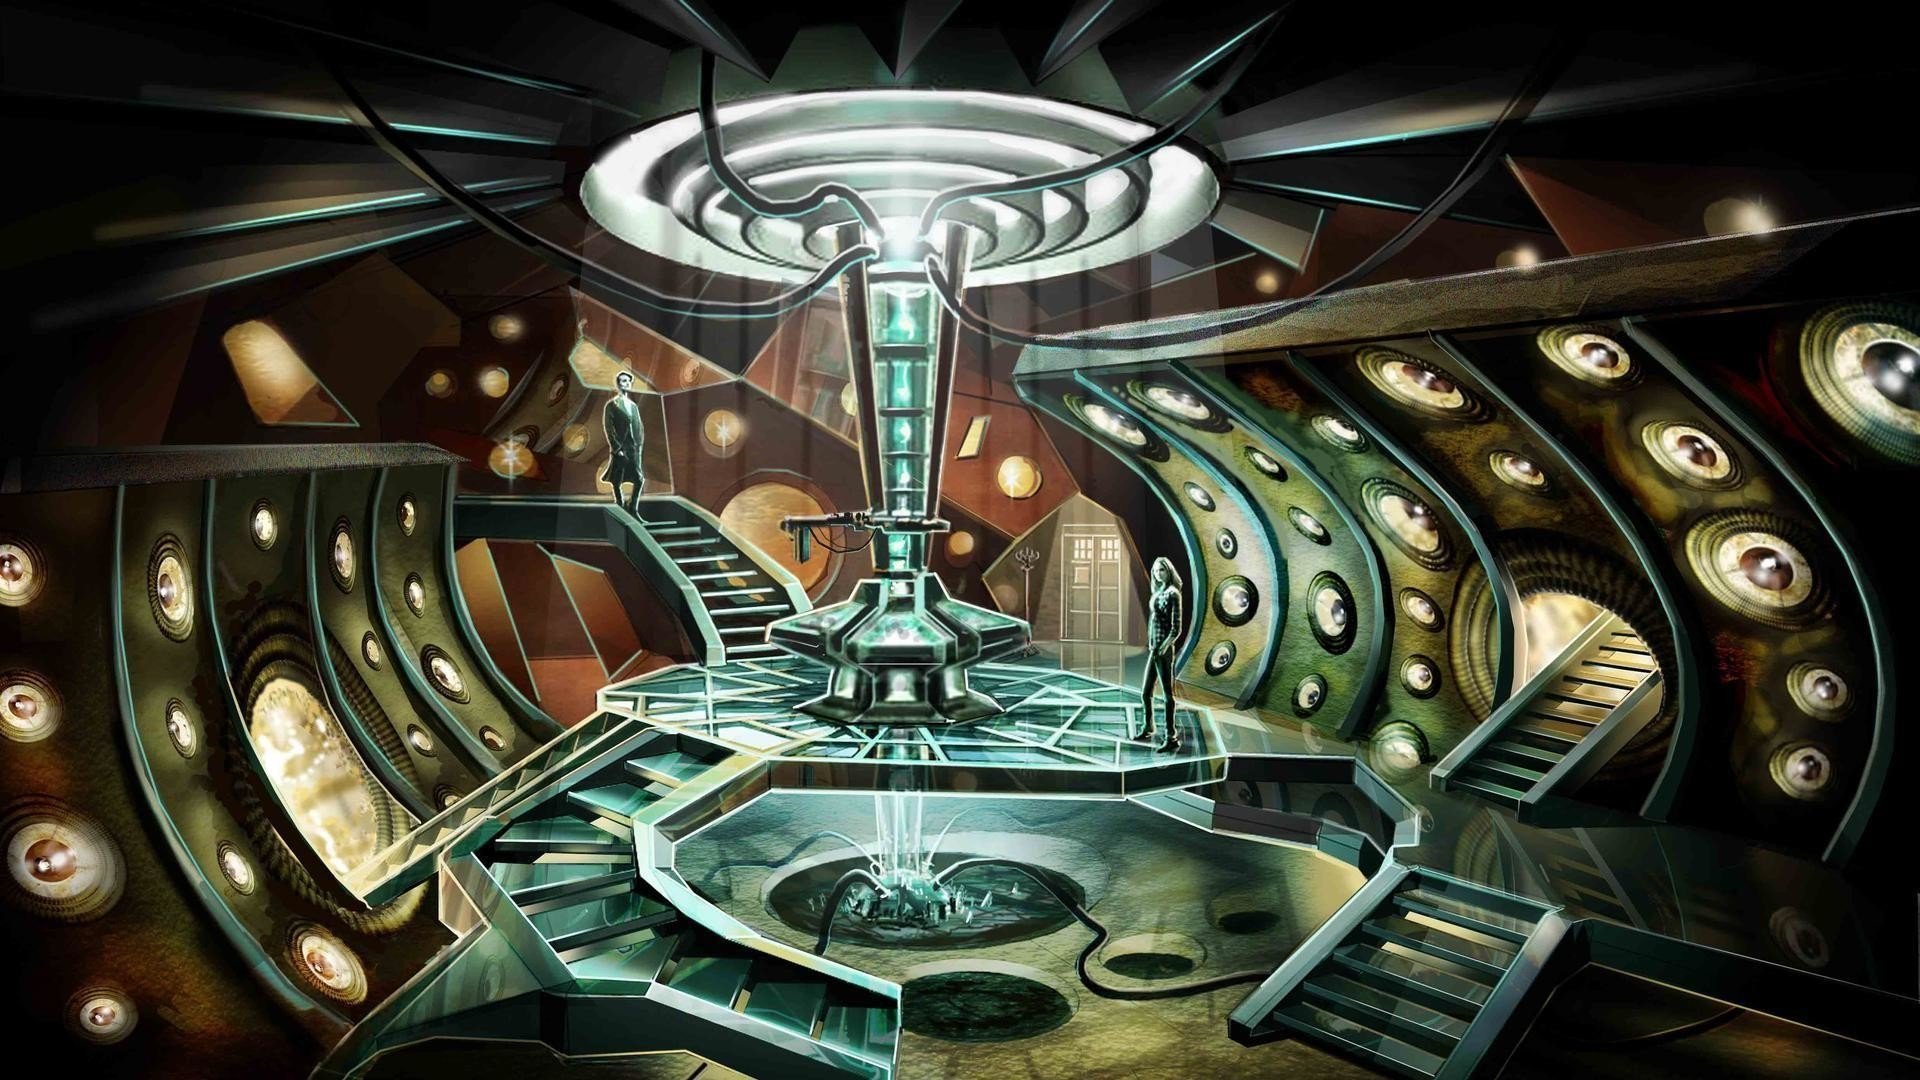 Res: 1920x1080, Doctor Who Tardis doctor who Games TARDIS HD Wallpapers, Desktop .